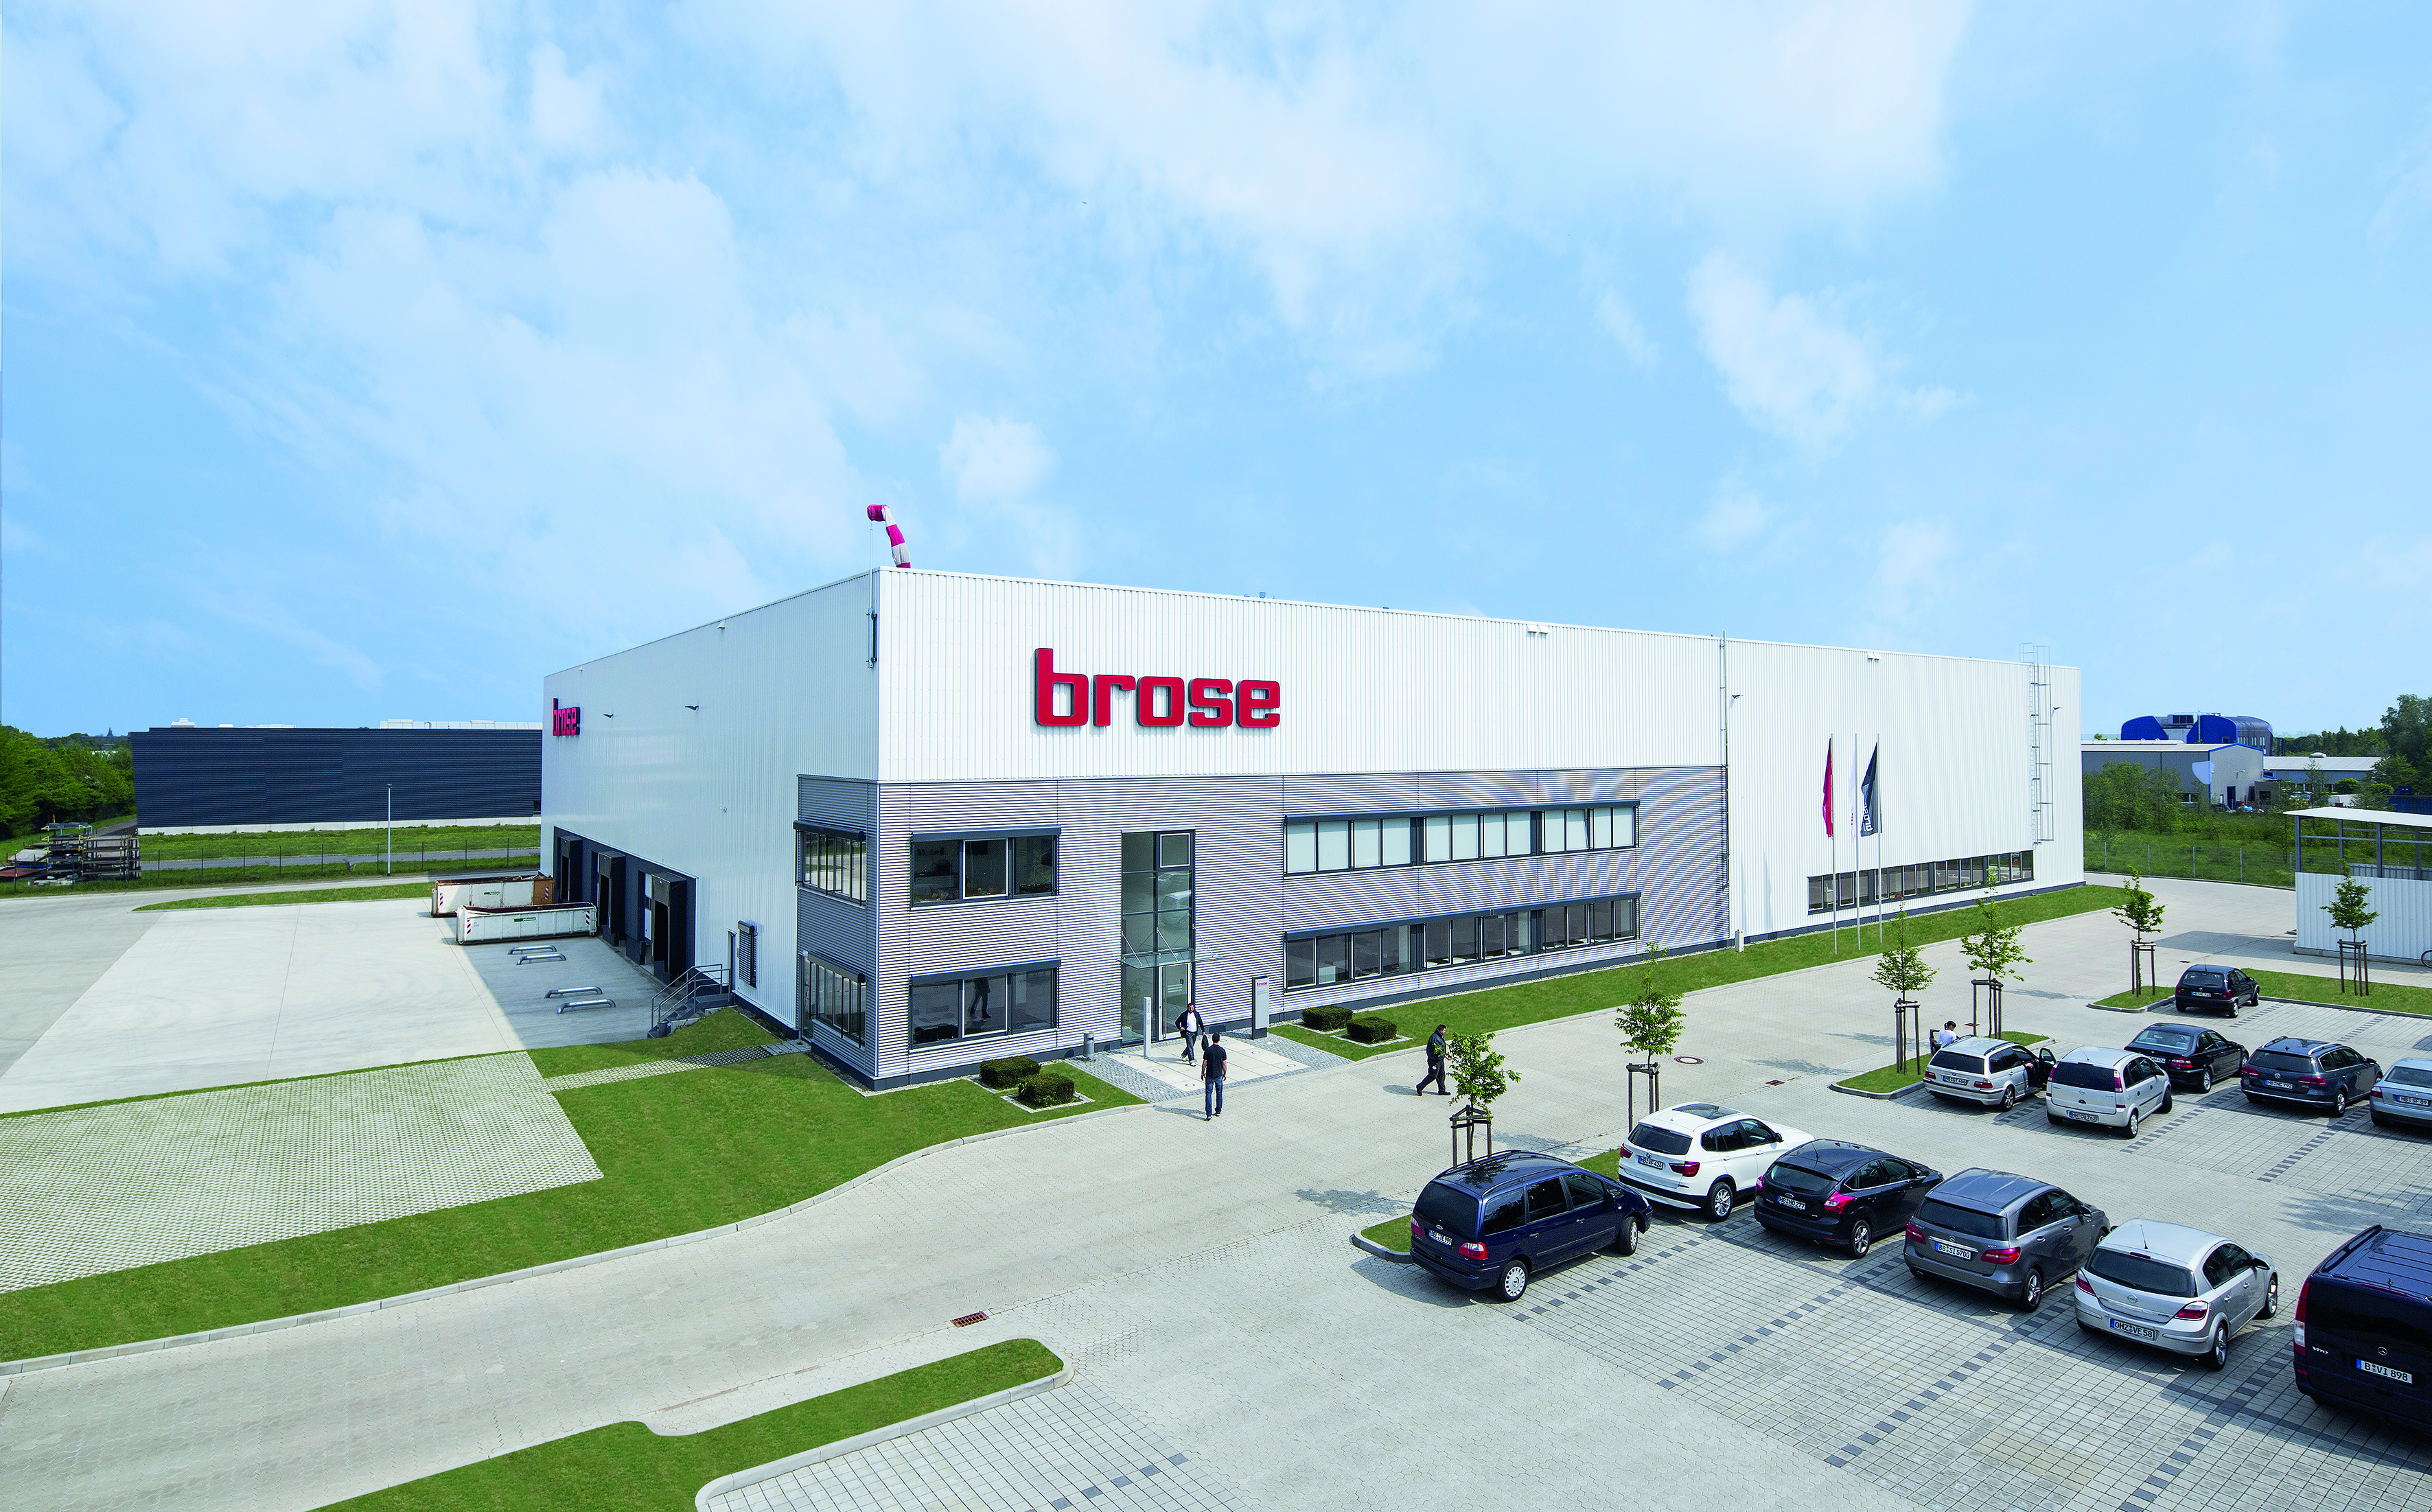 Brose Bremen